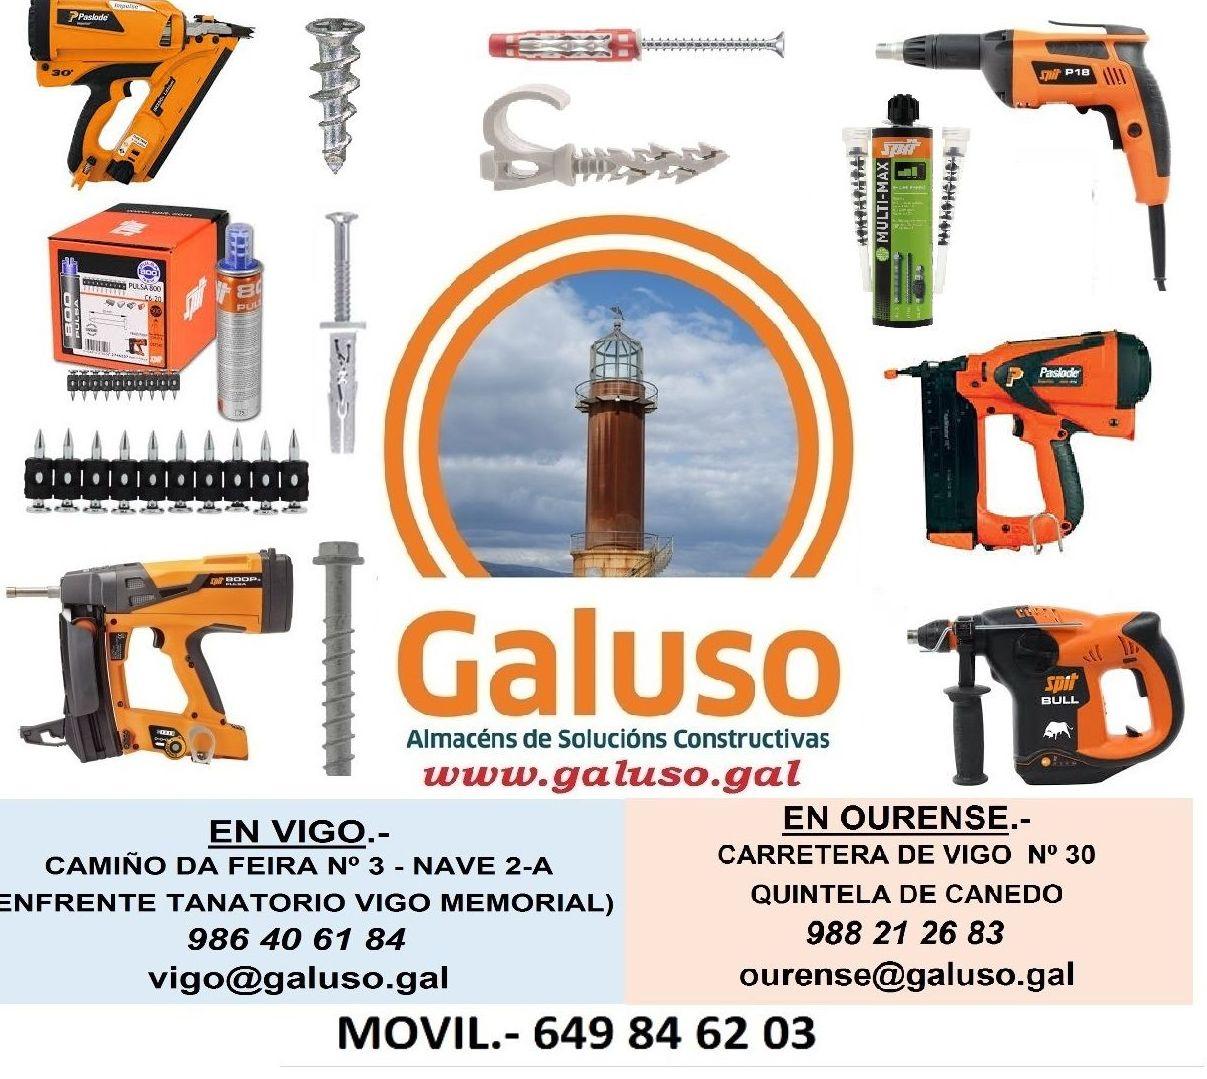 SPIT 2020-1: Catálogo de Galuso